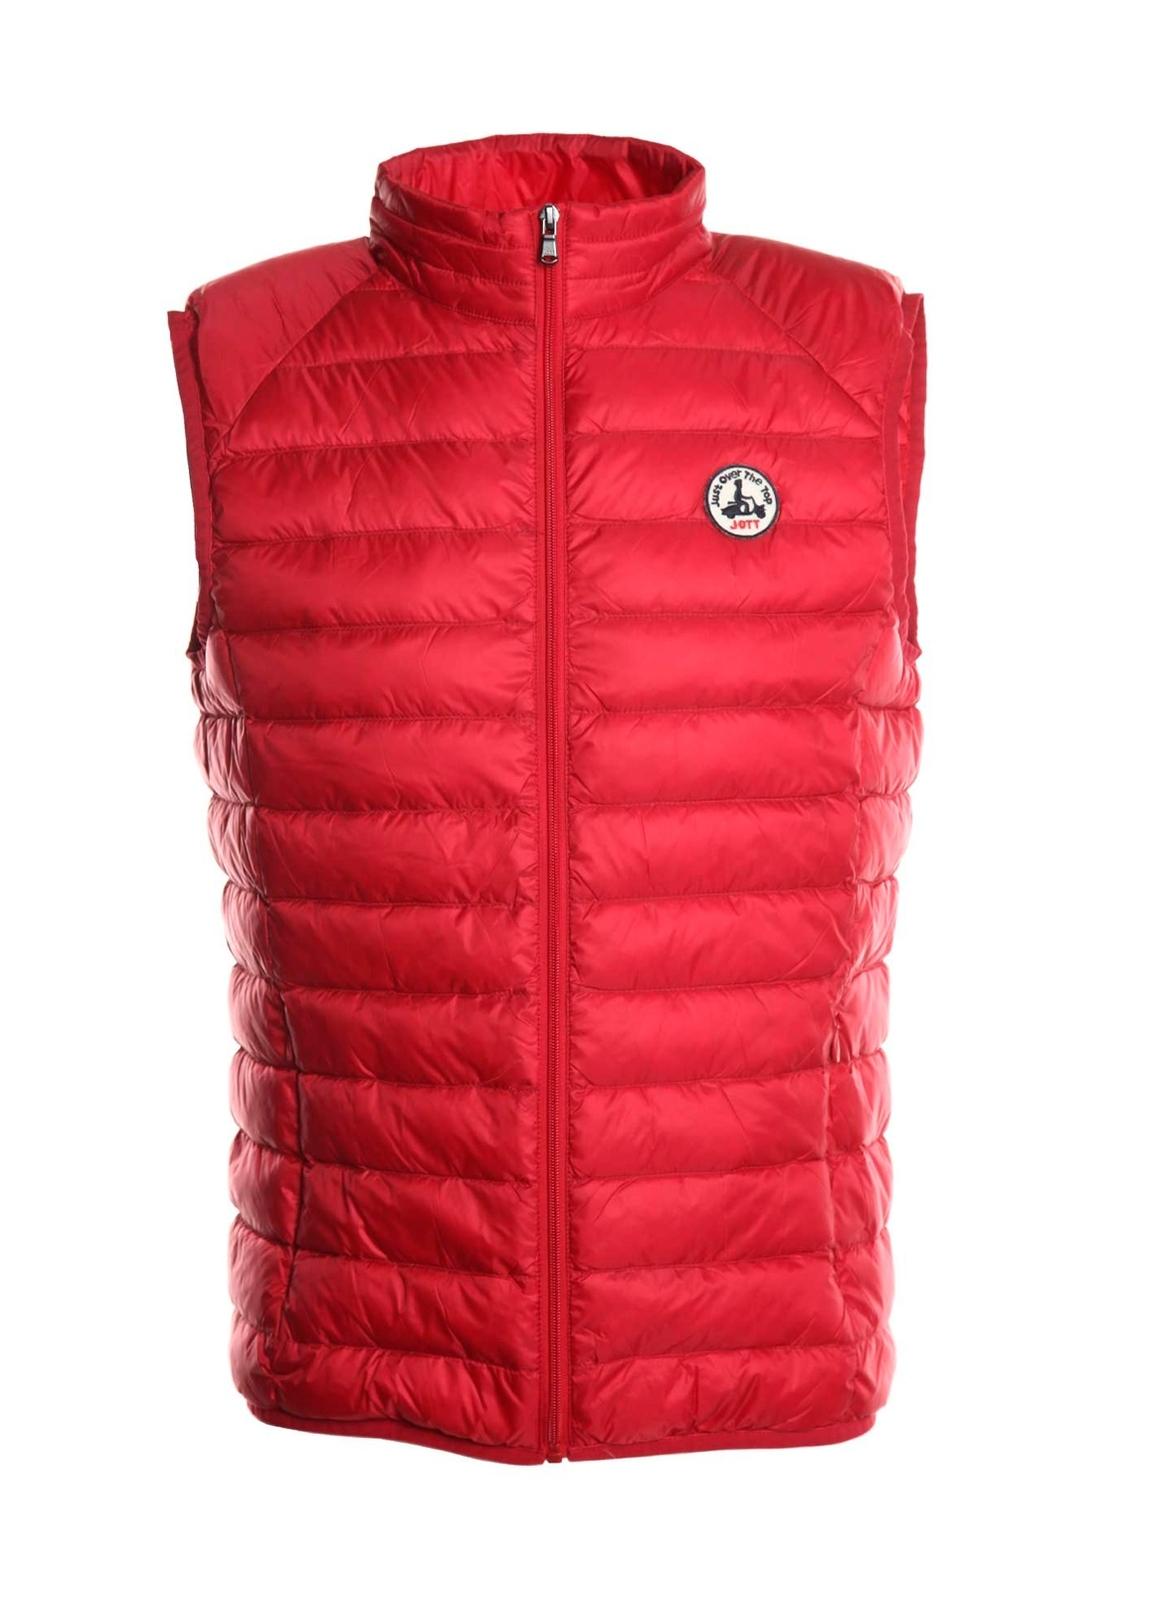 Chaleco ligero modelo TOM color rojo.